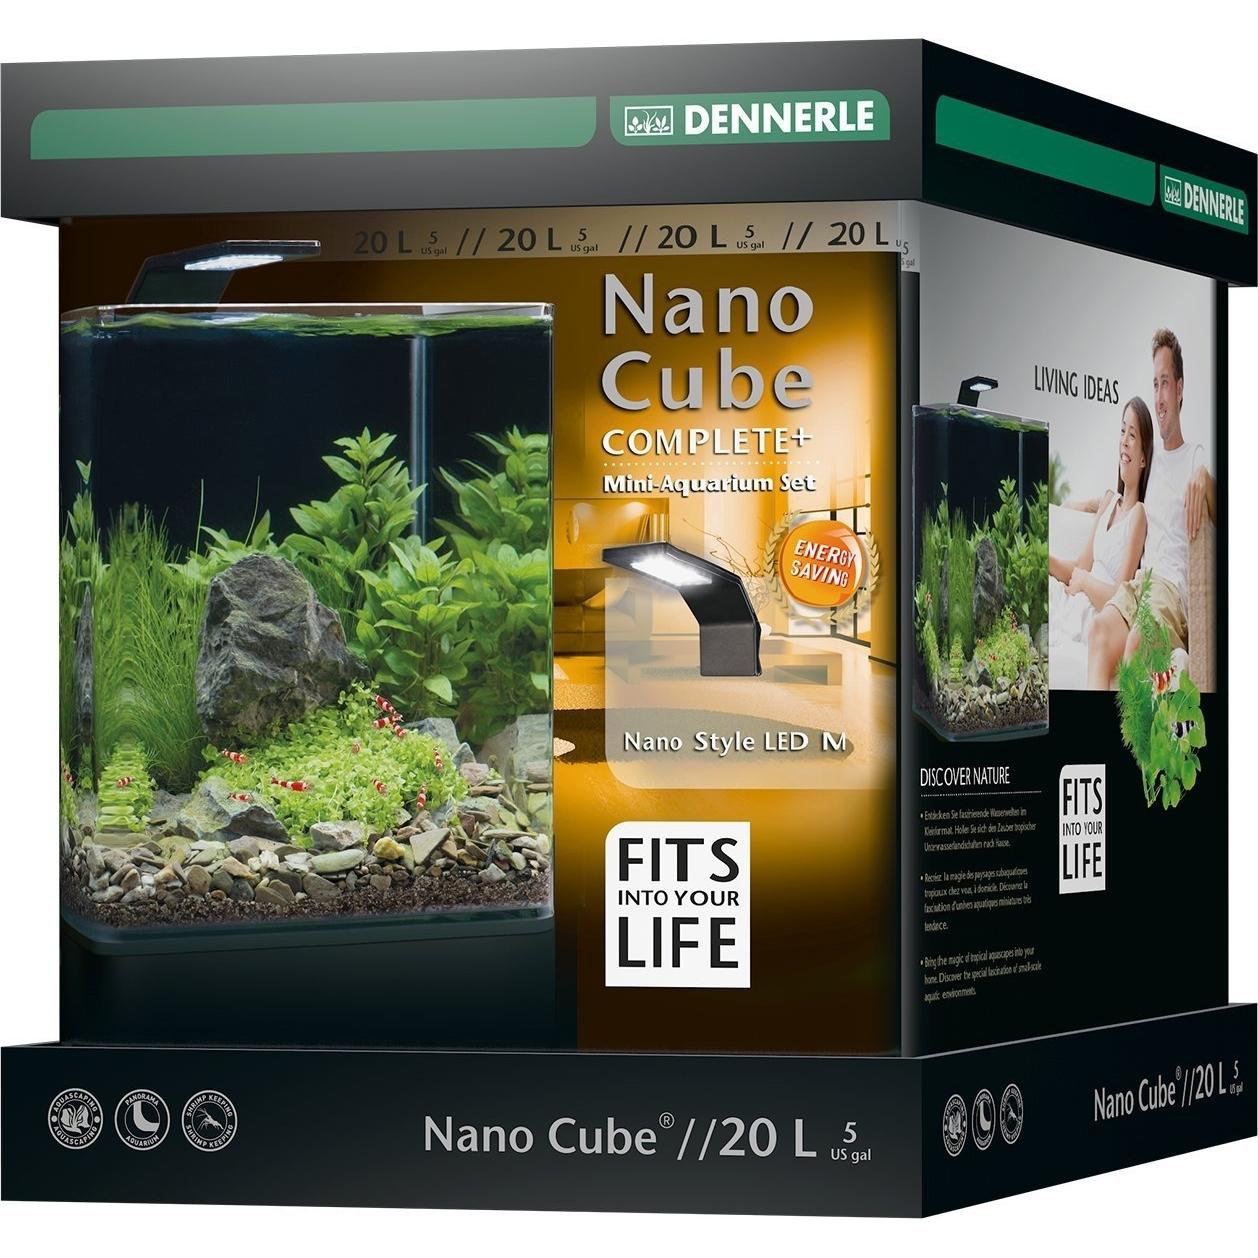 Dennerle NanoCube Complete+ Style LED, Bild 5